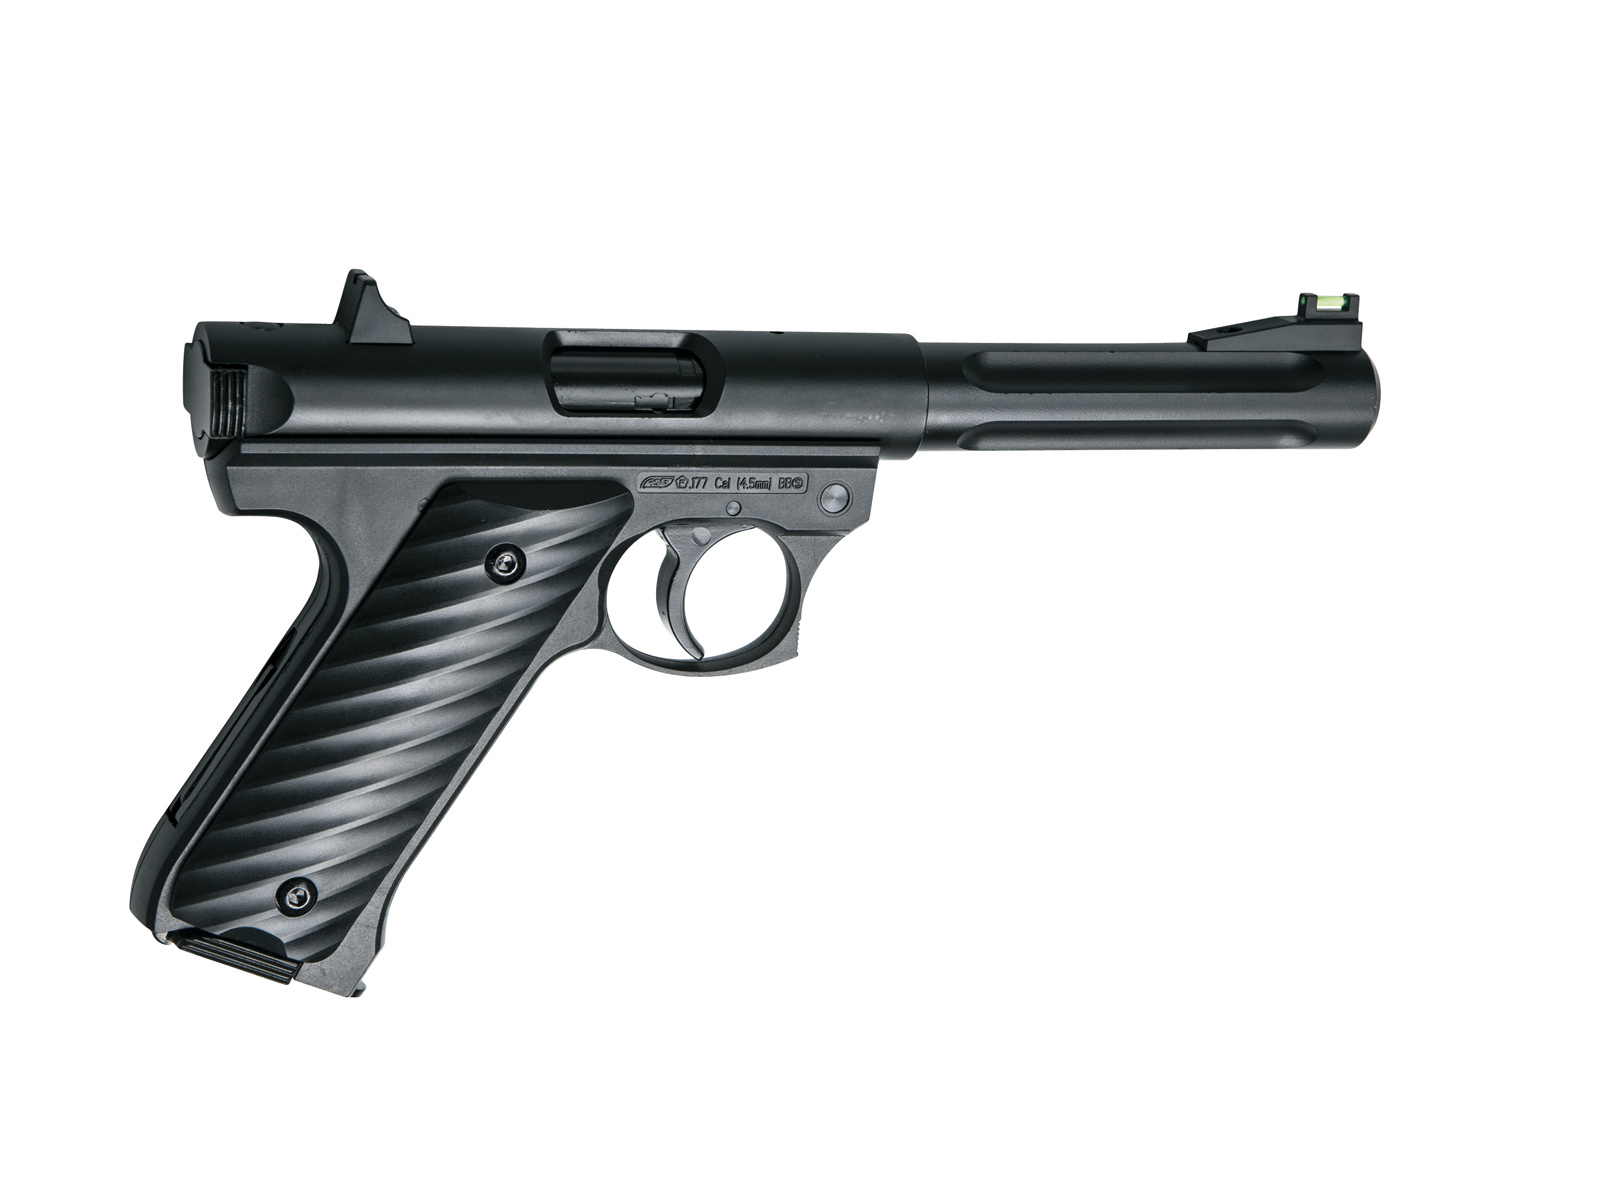 ASG ASG MK II Pistol